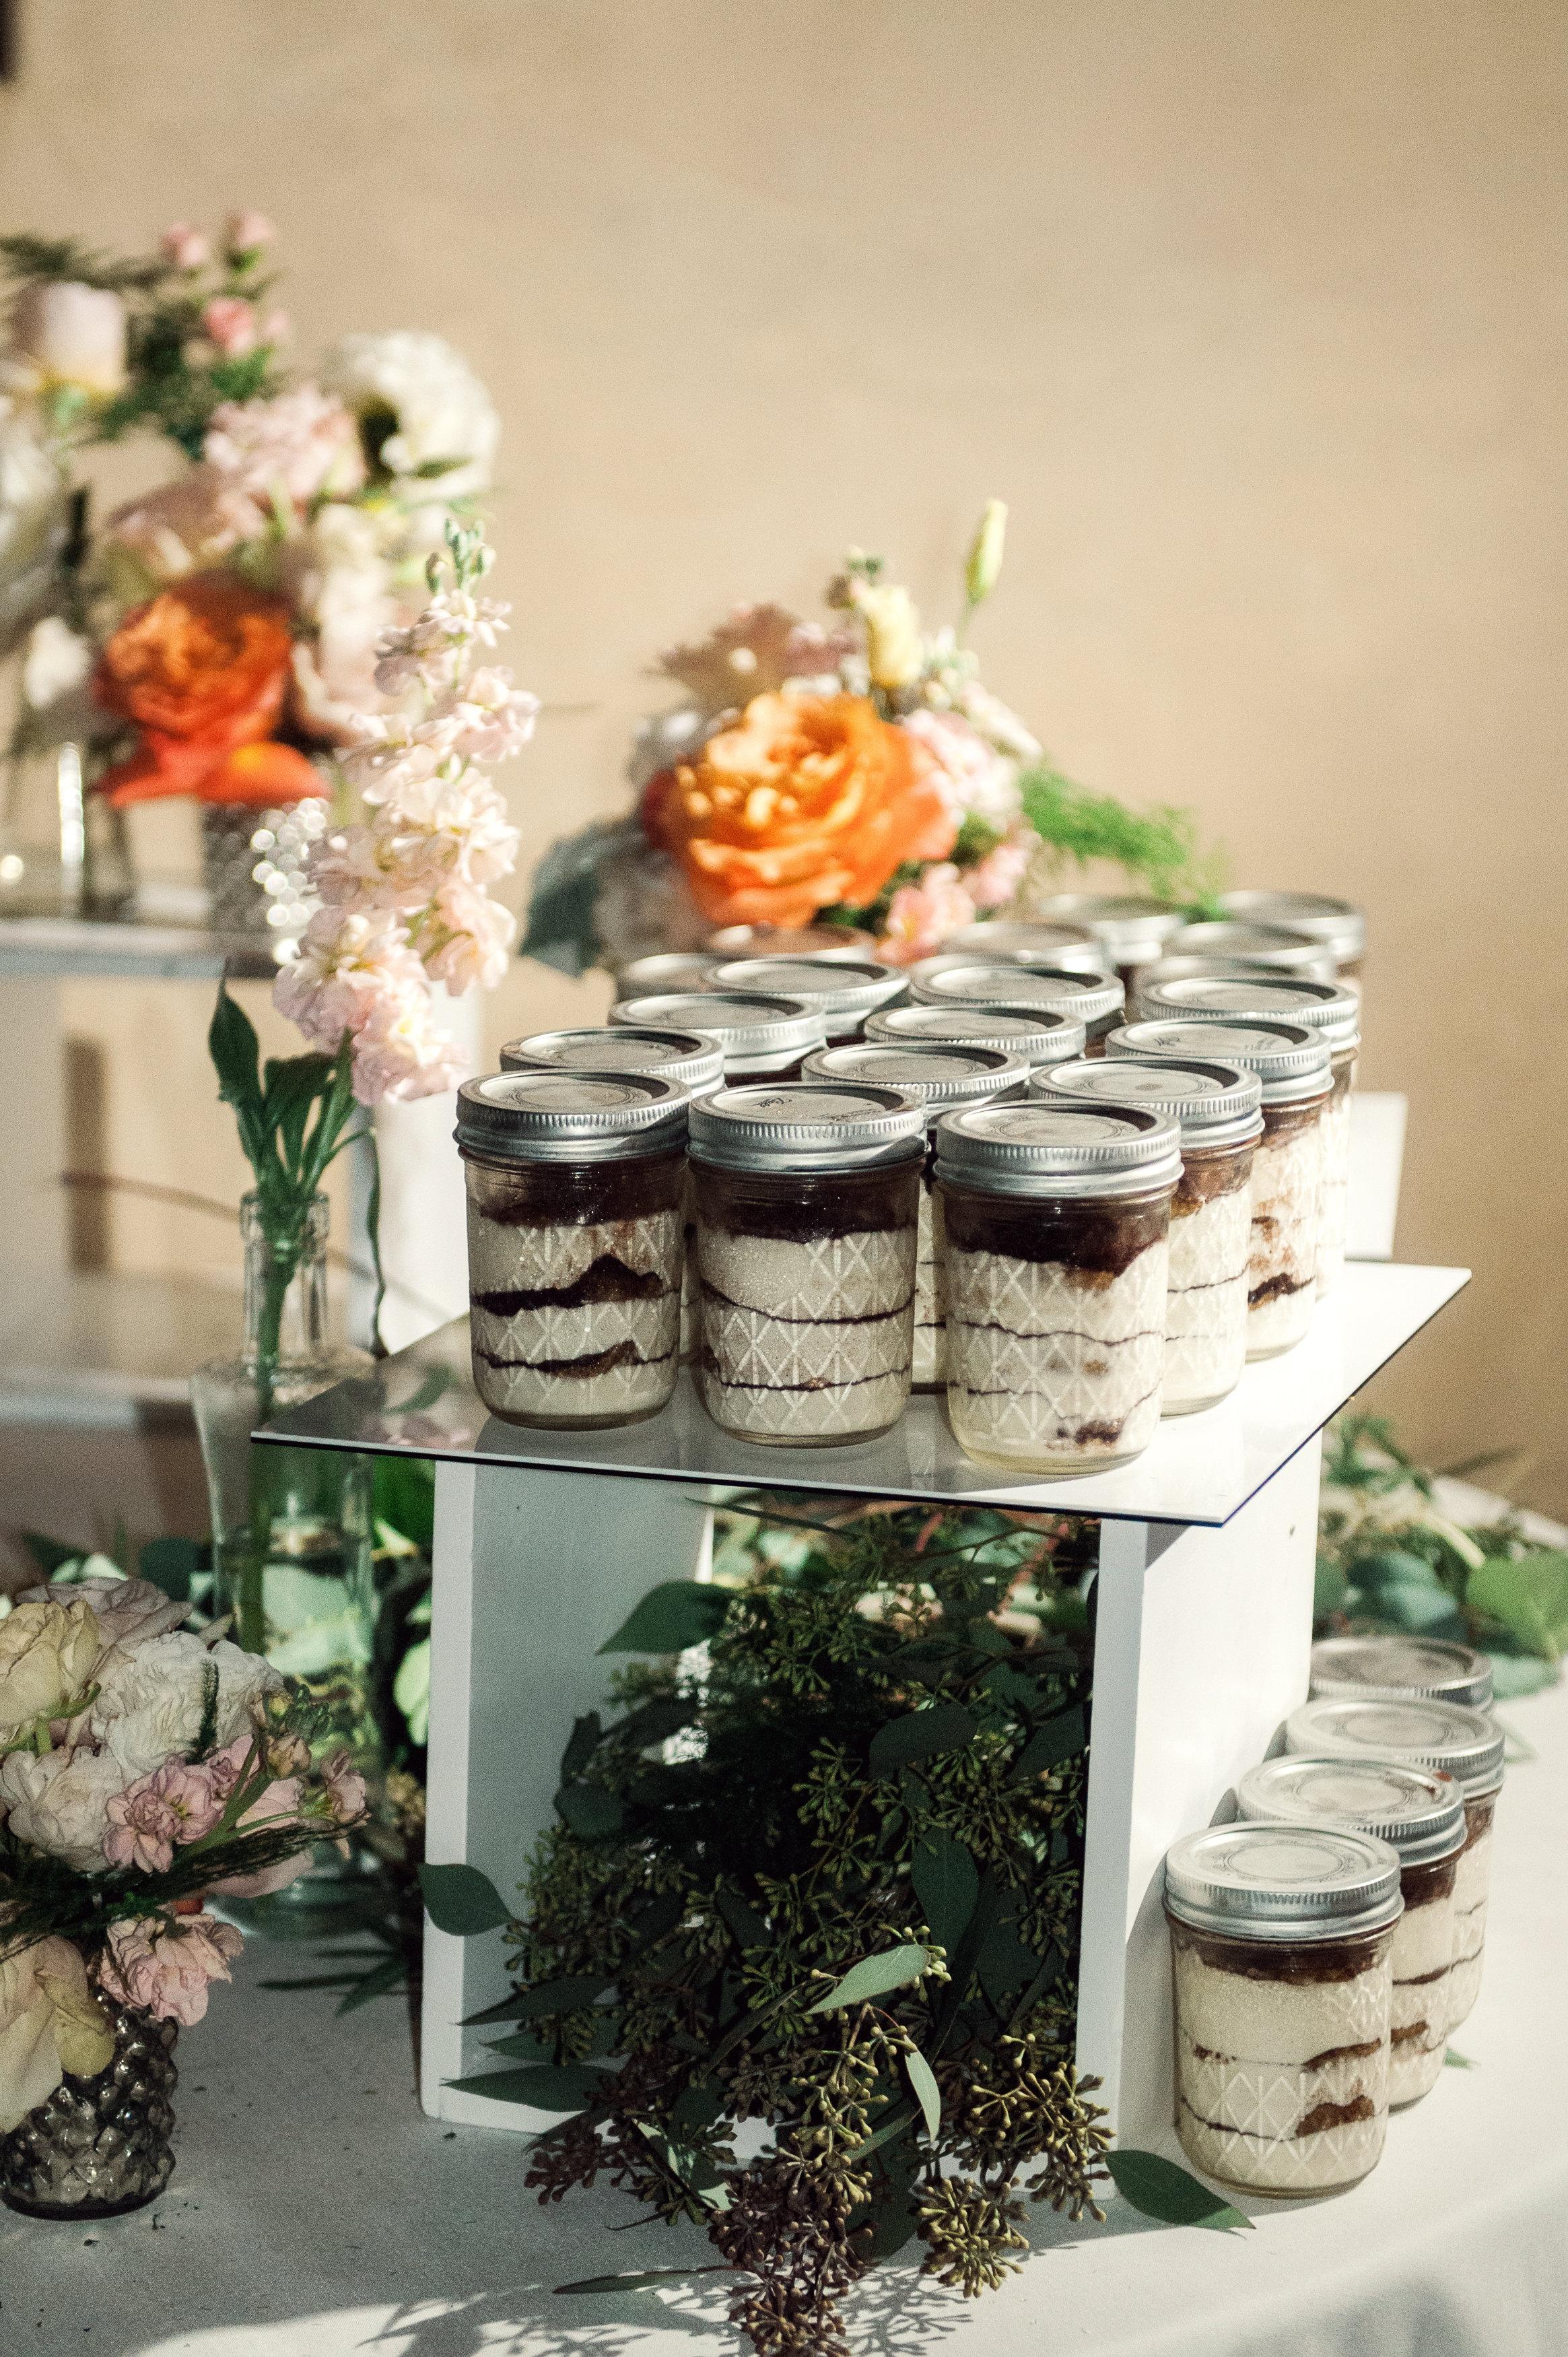 santabarbarawedding.com | Wisteria Lane Flroal Design Studio | Bride and Groom | Garden Roses | Tea Roses | Favor and Dessert Station Decor